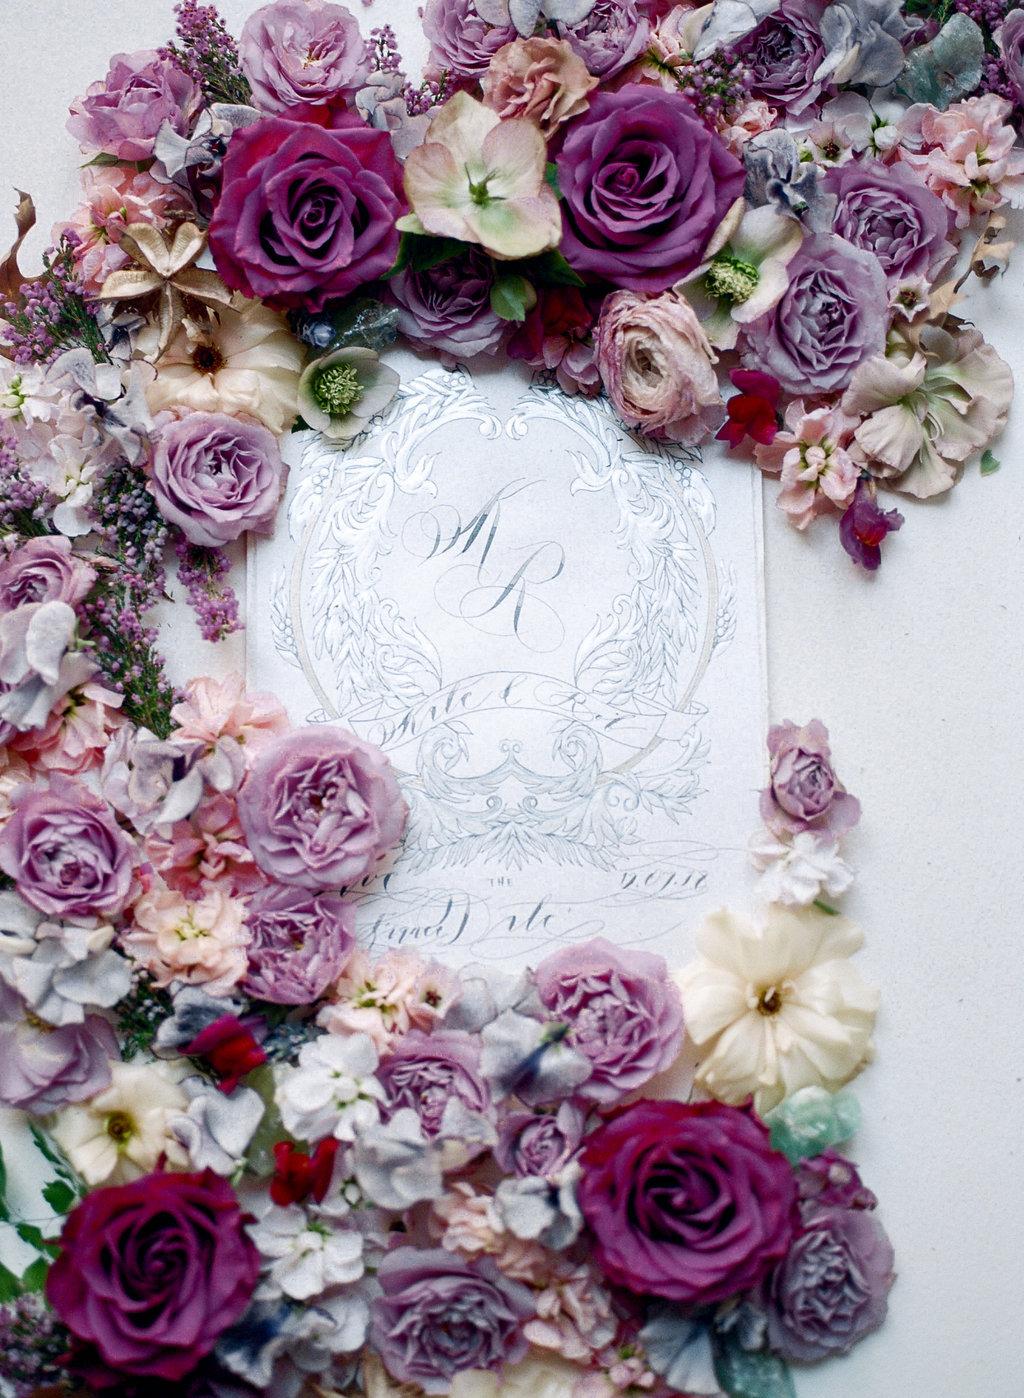 luxury event invitations in California with silver designs